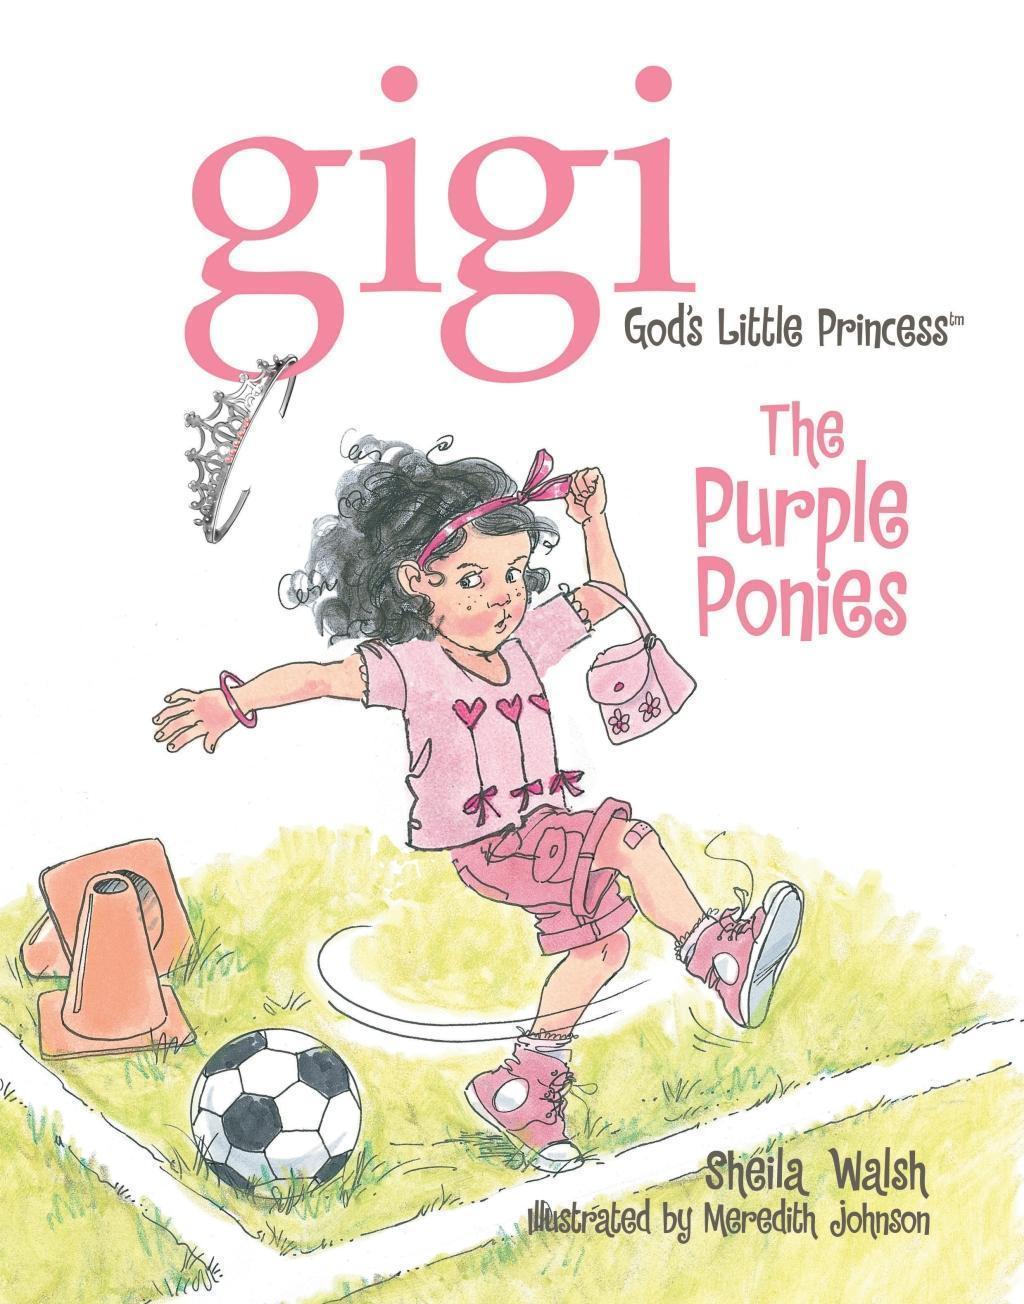 The Purple Ponies